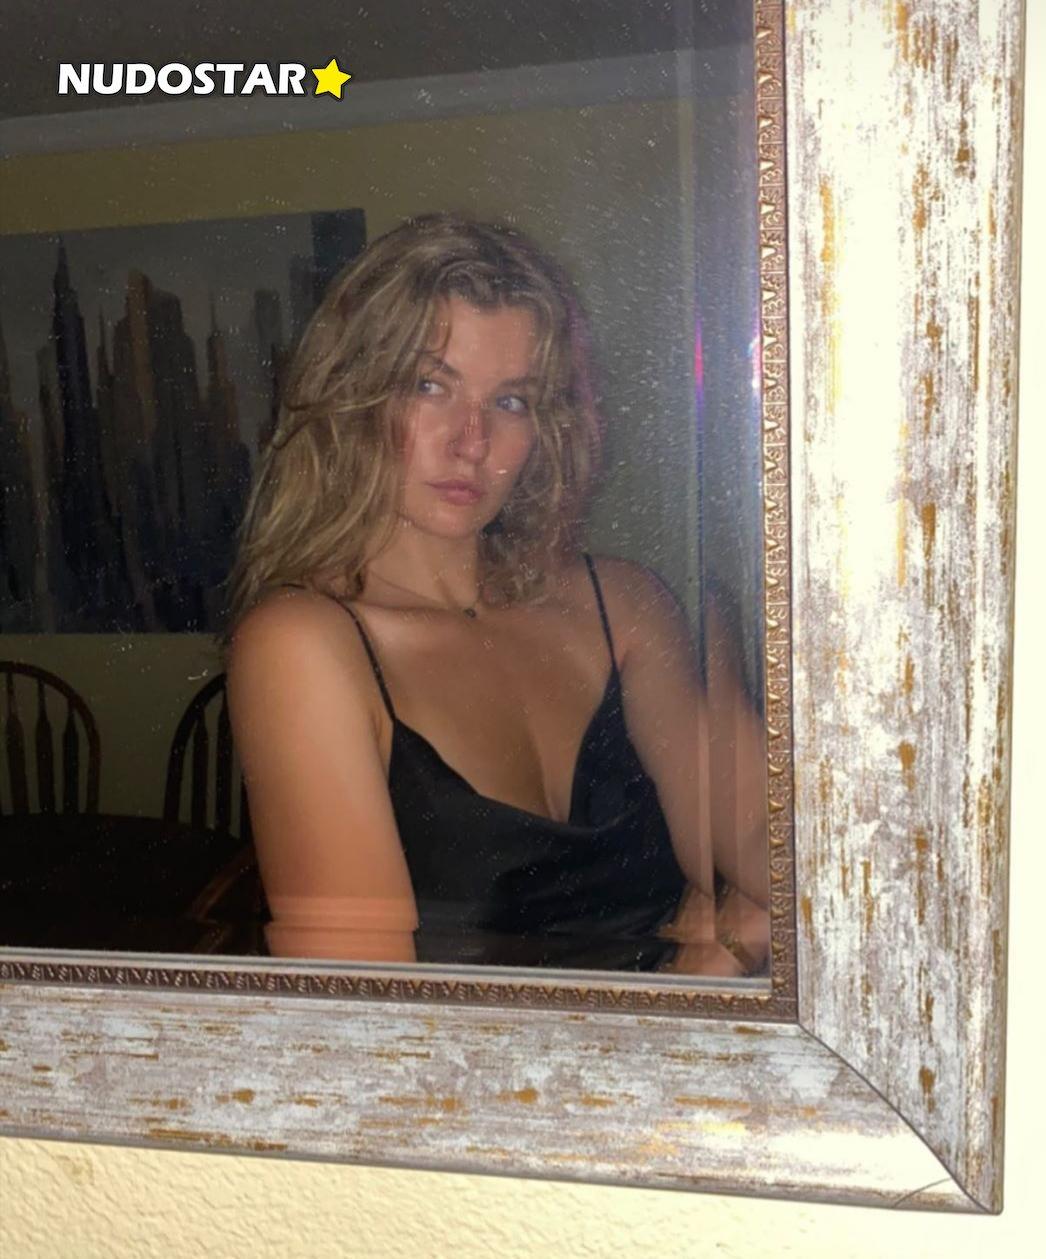 Mia Melano Miamelano777 Onlyfans Nude Leaks 0019